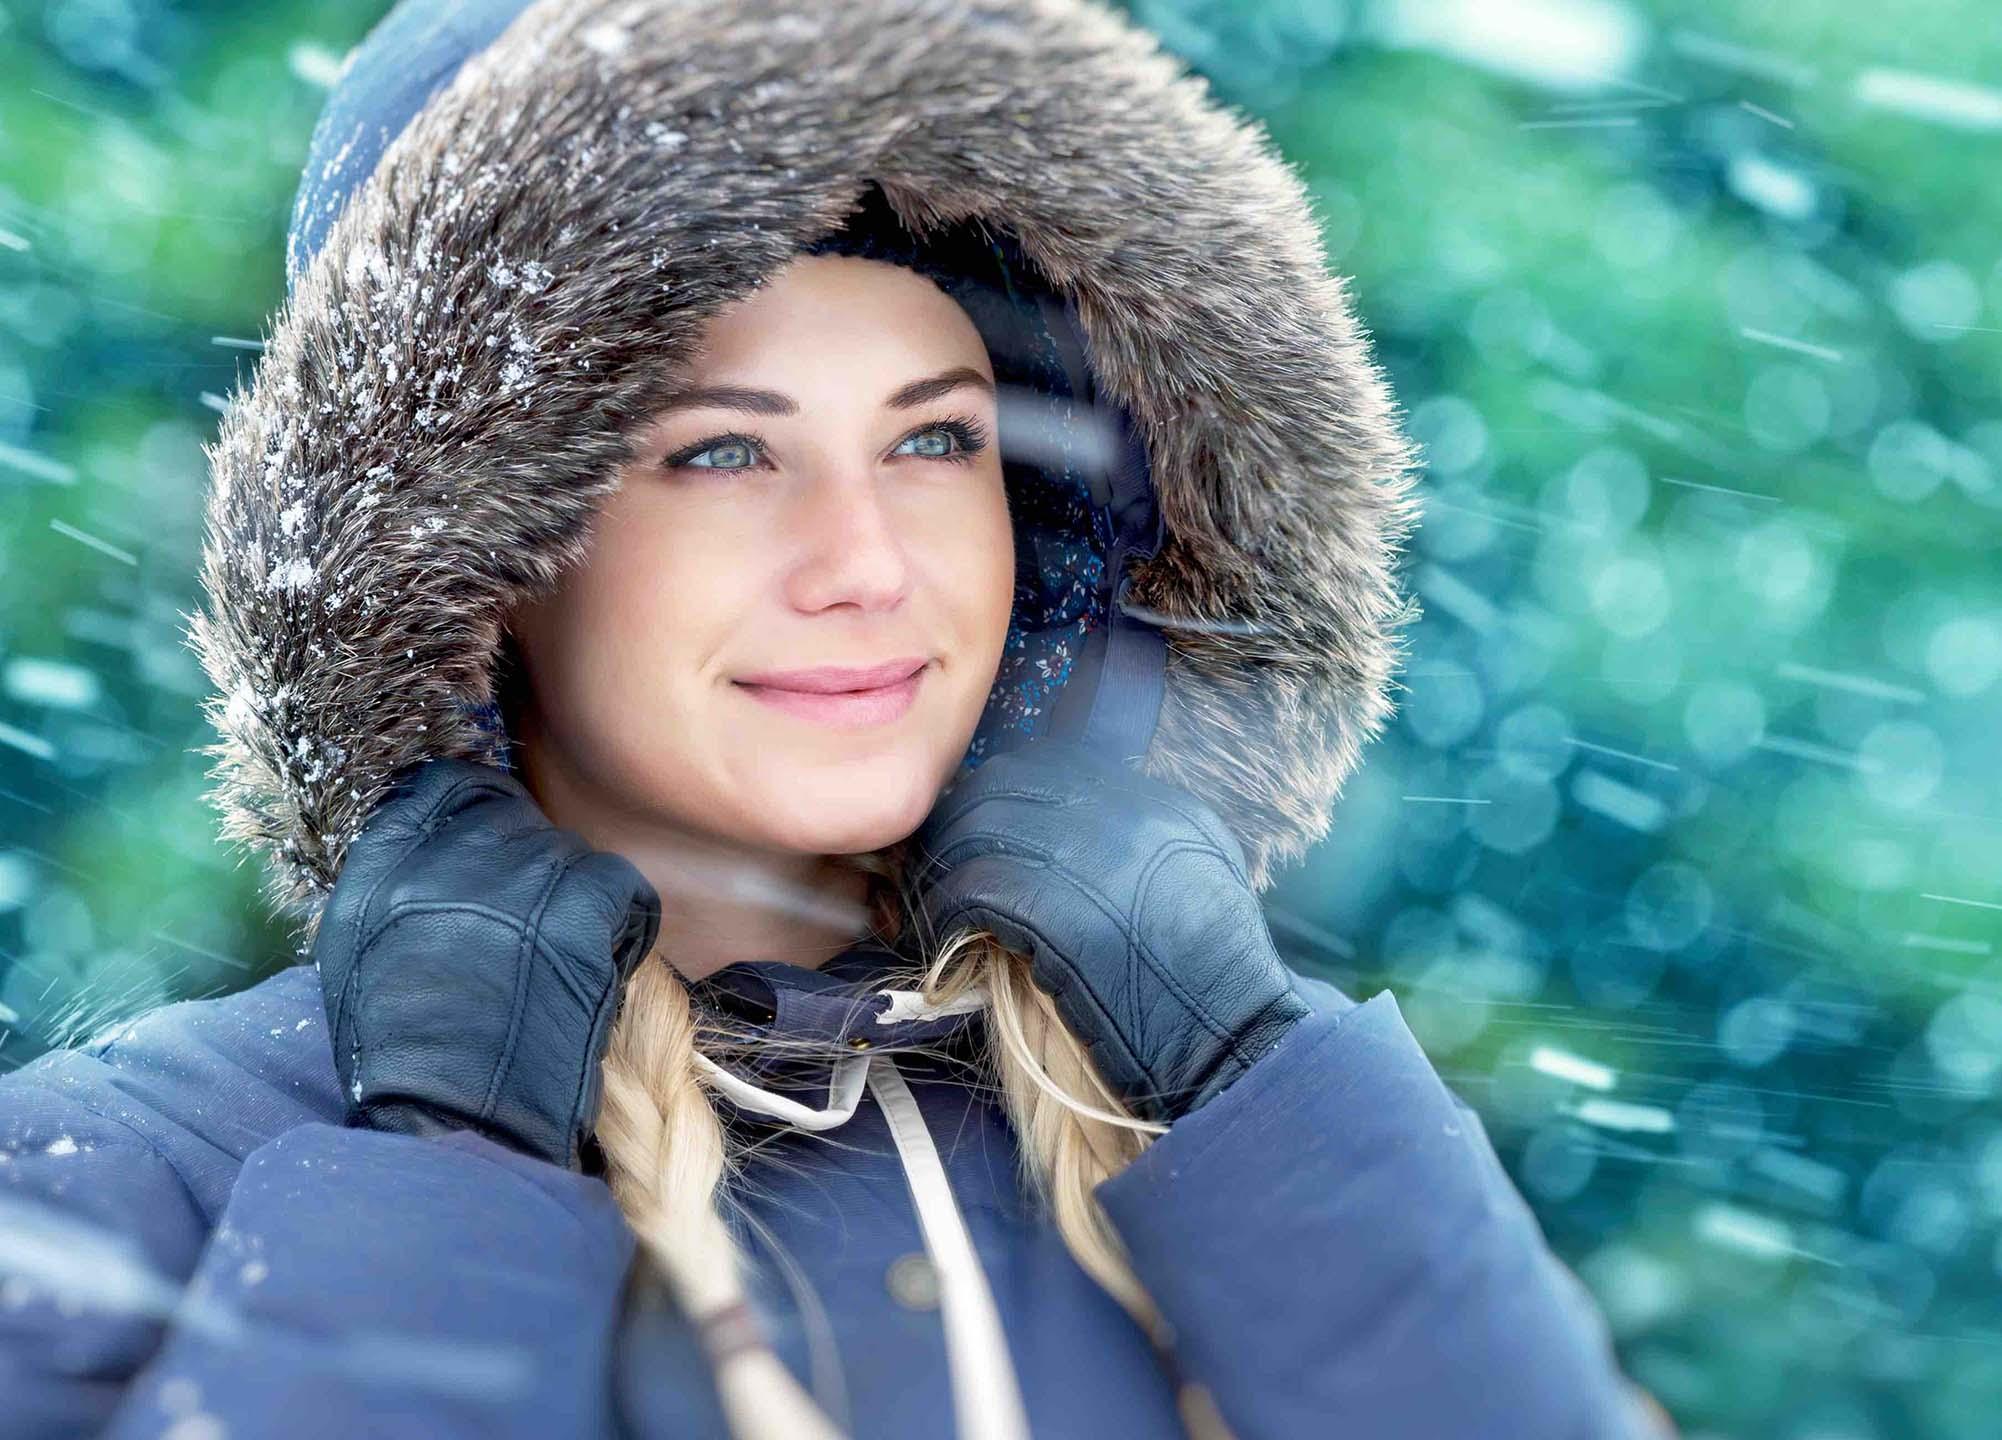 winter woman portrait PK2UDB4